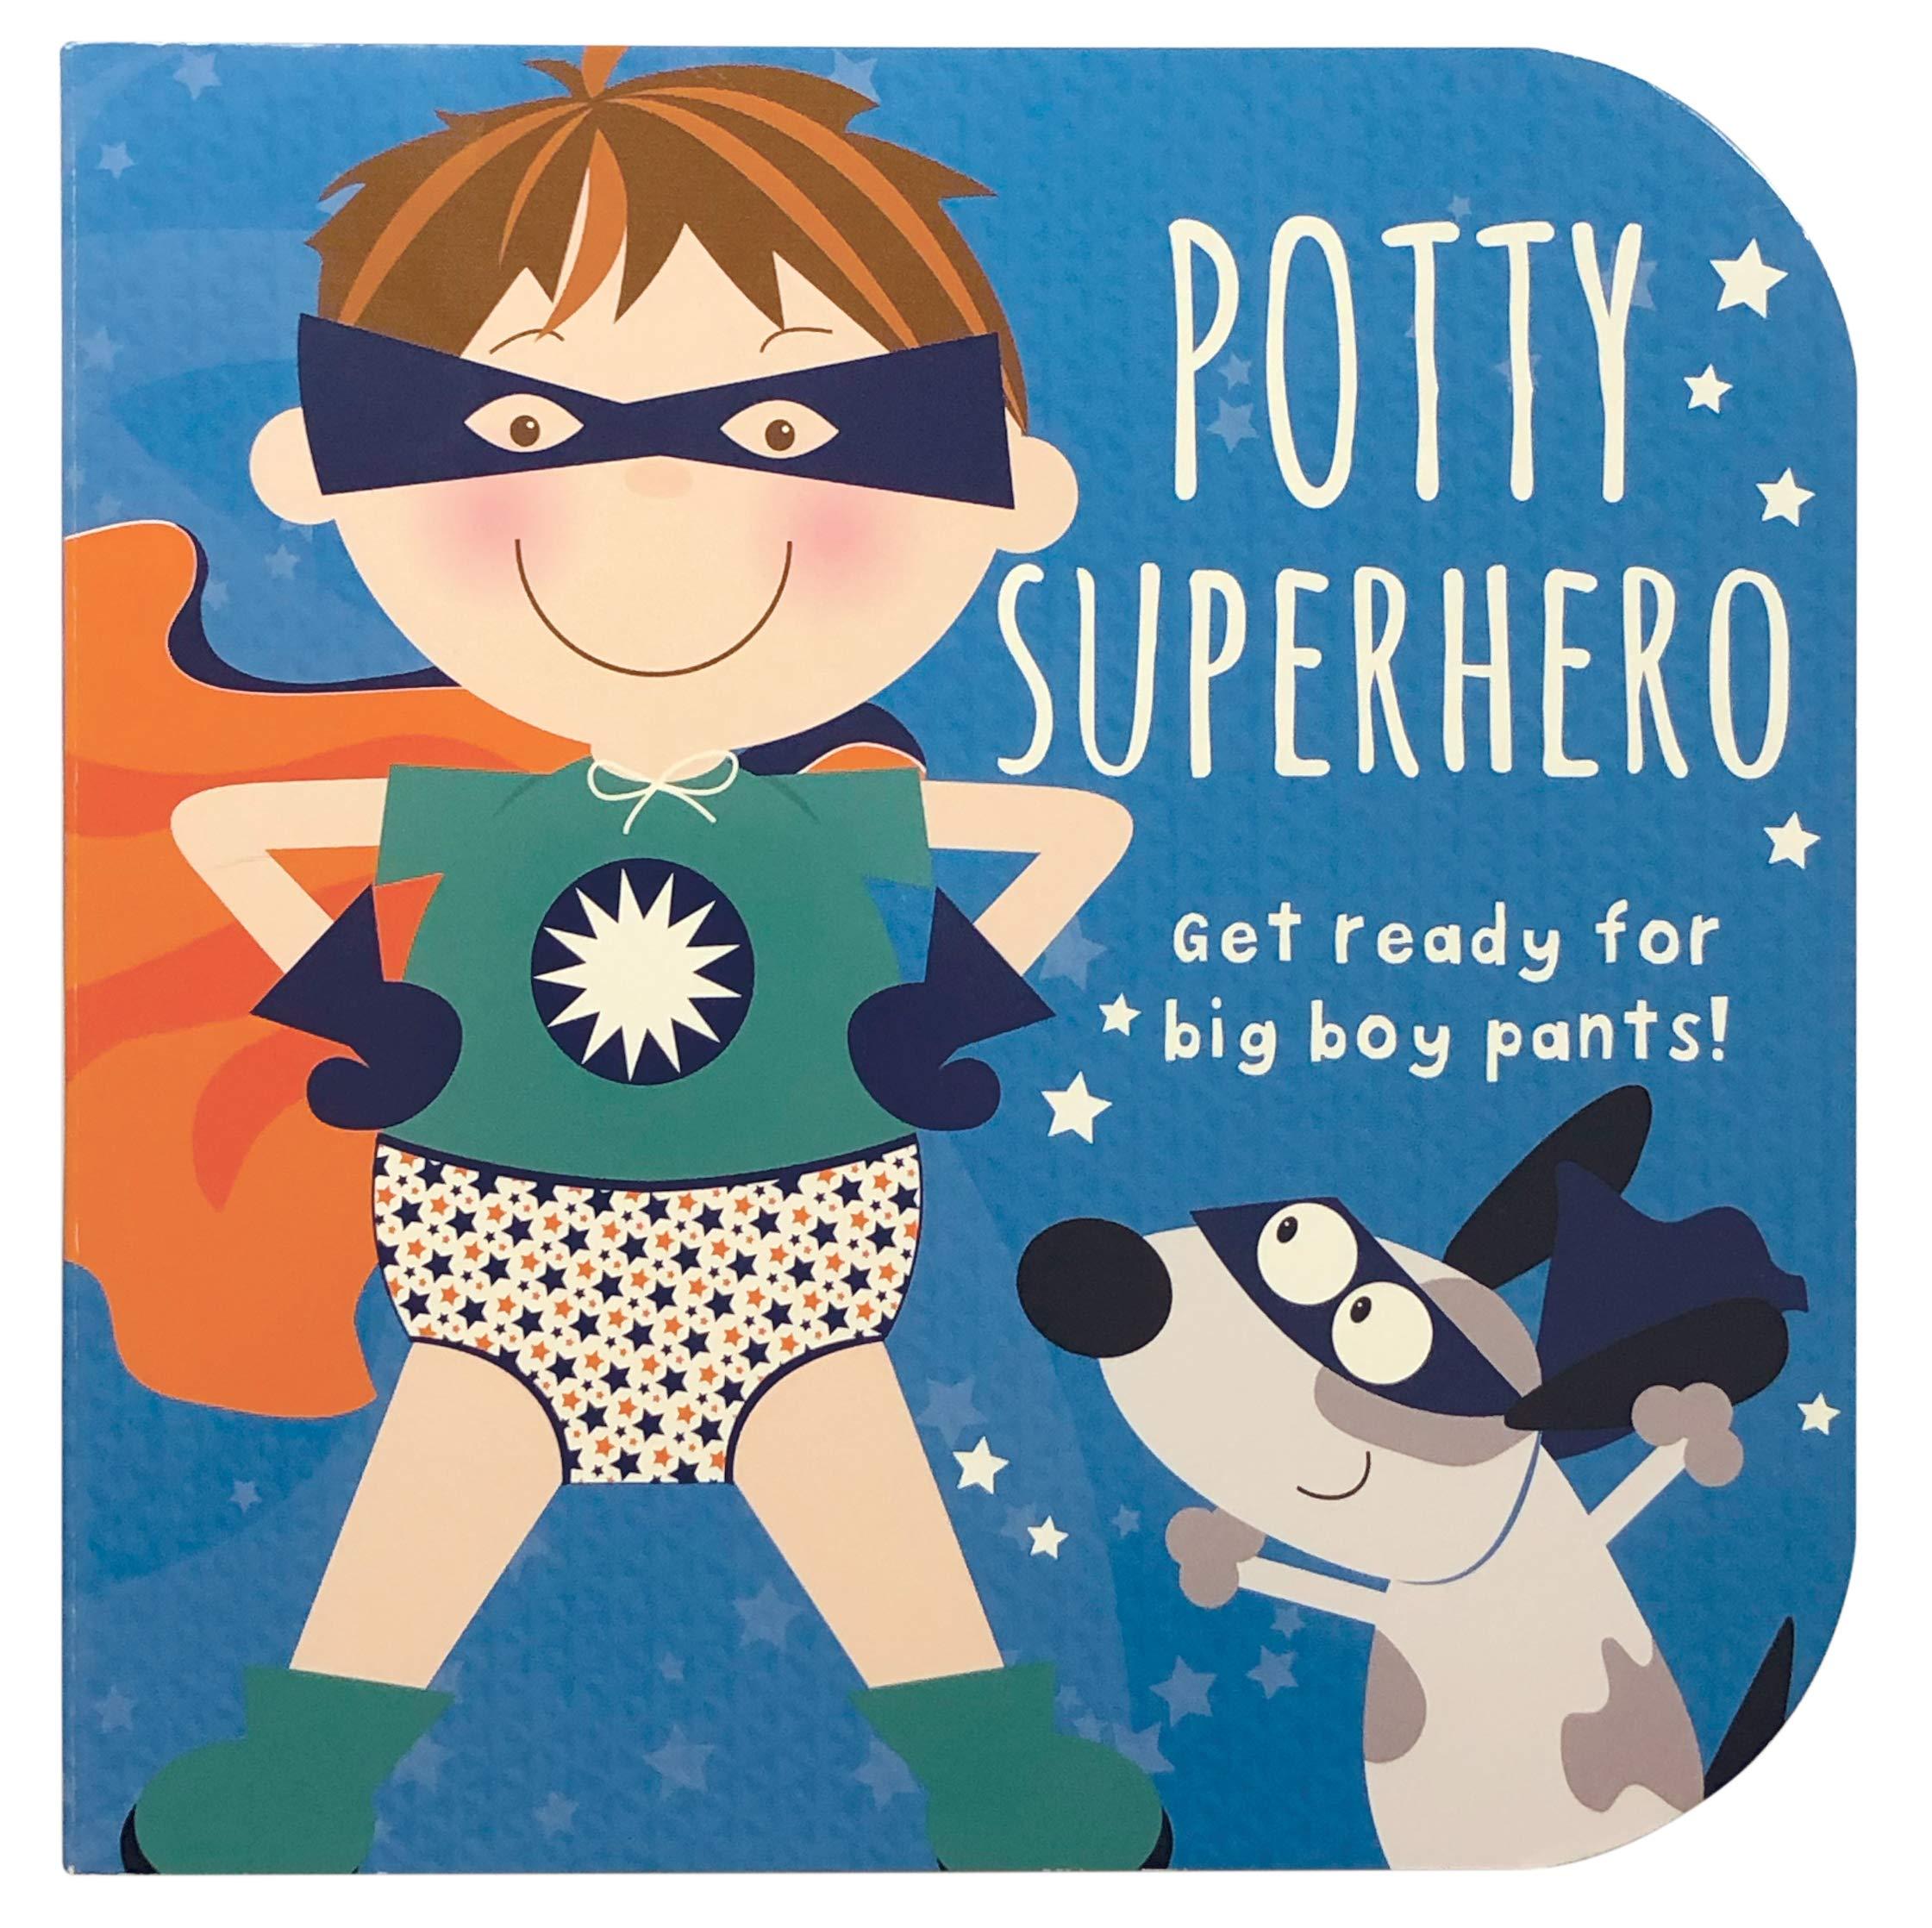 Potty Superhero: Get Ready for Big Boy Pants!: Parragon Books, Mabel  Forsyth, Mabel Forsyth: 9781680524574: Amazon.com: Books